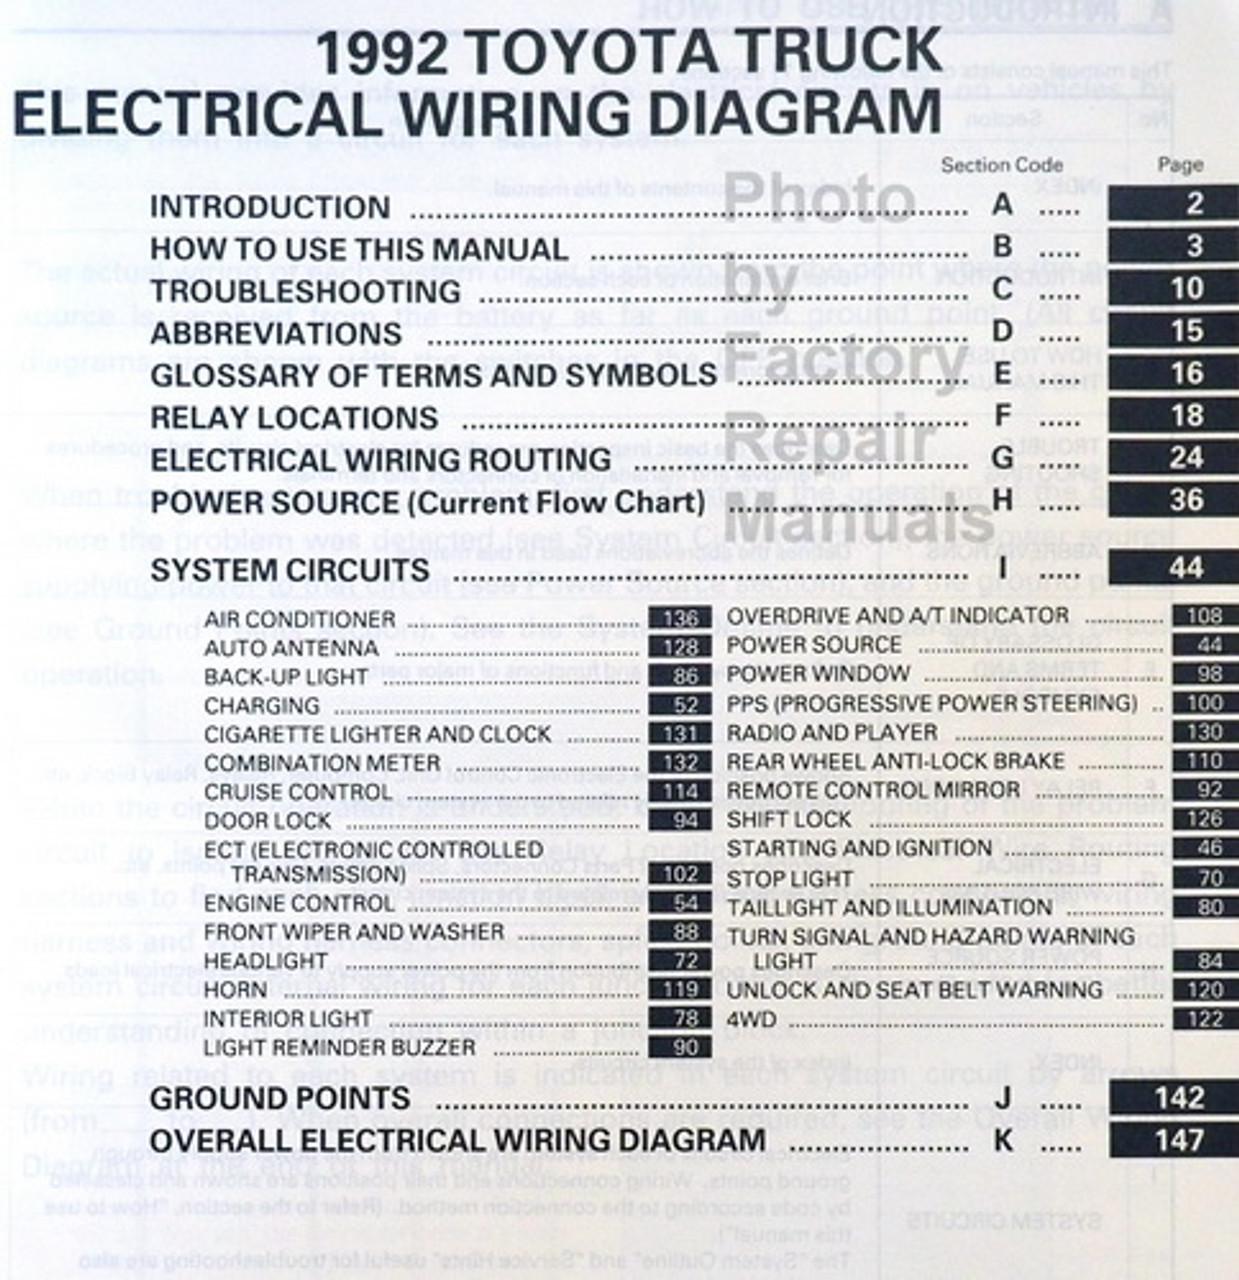 98 Toyota Electrical Wiring Diagram